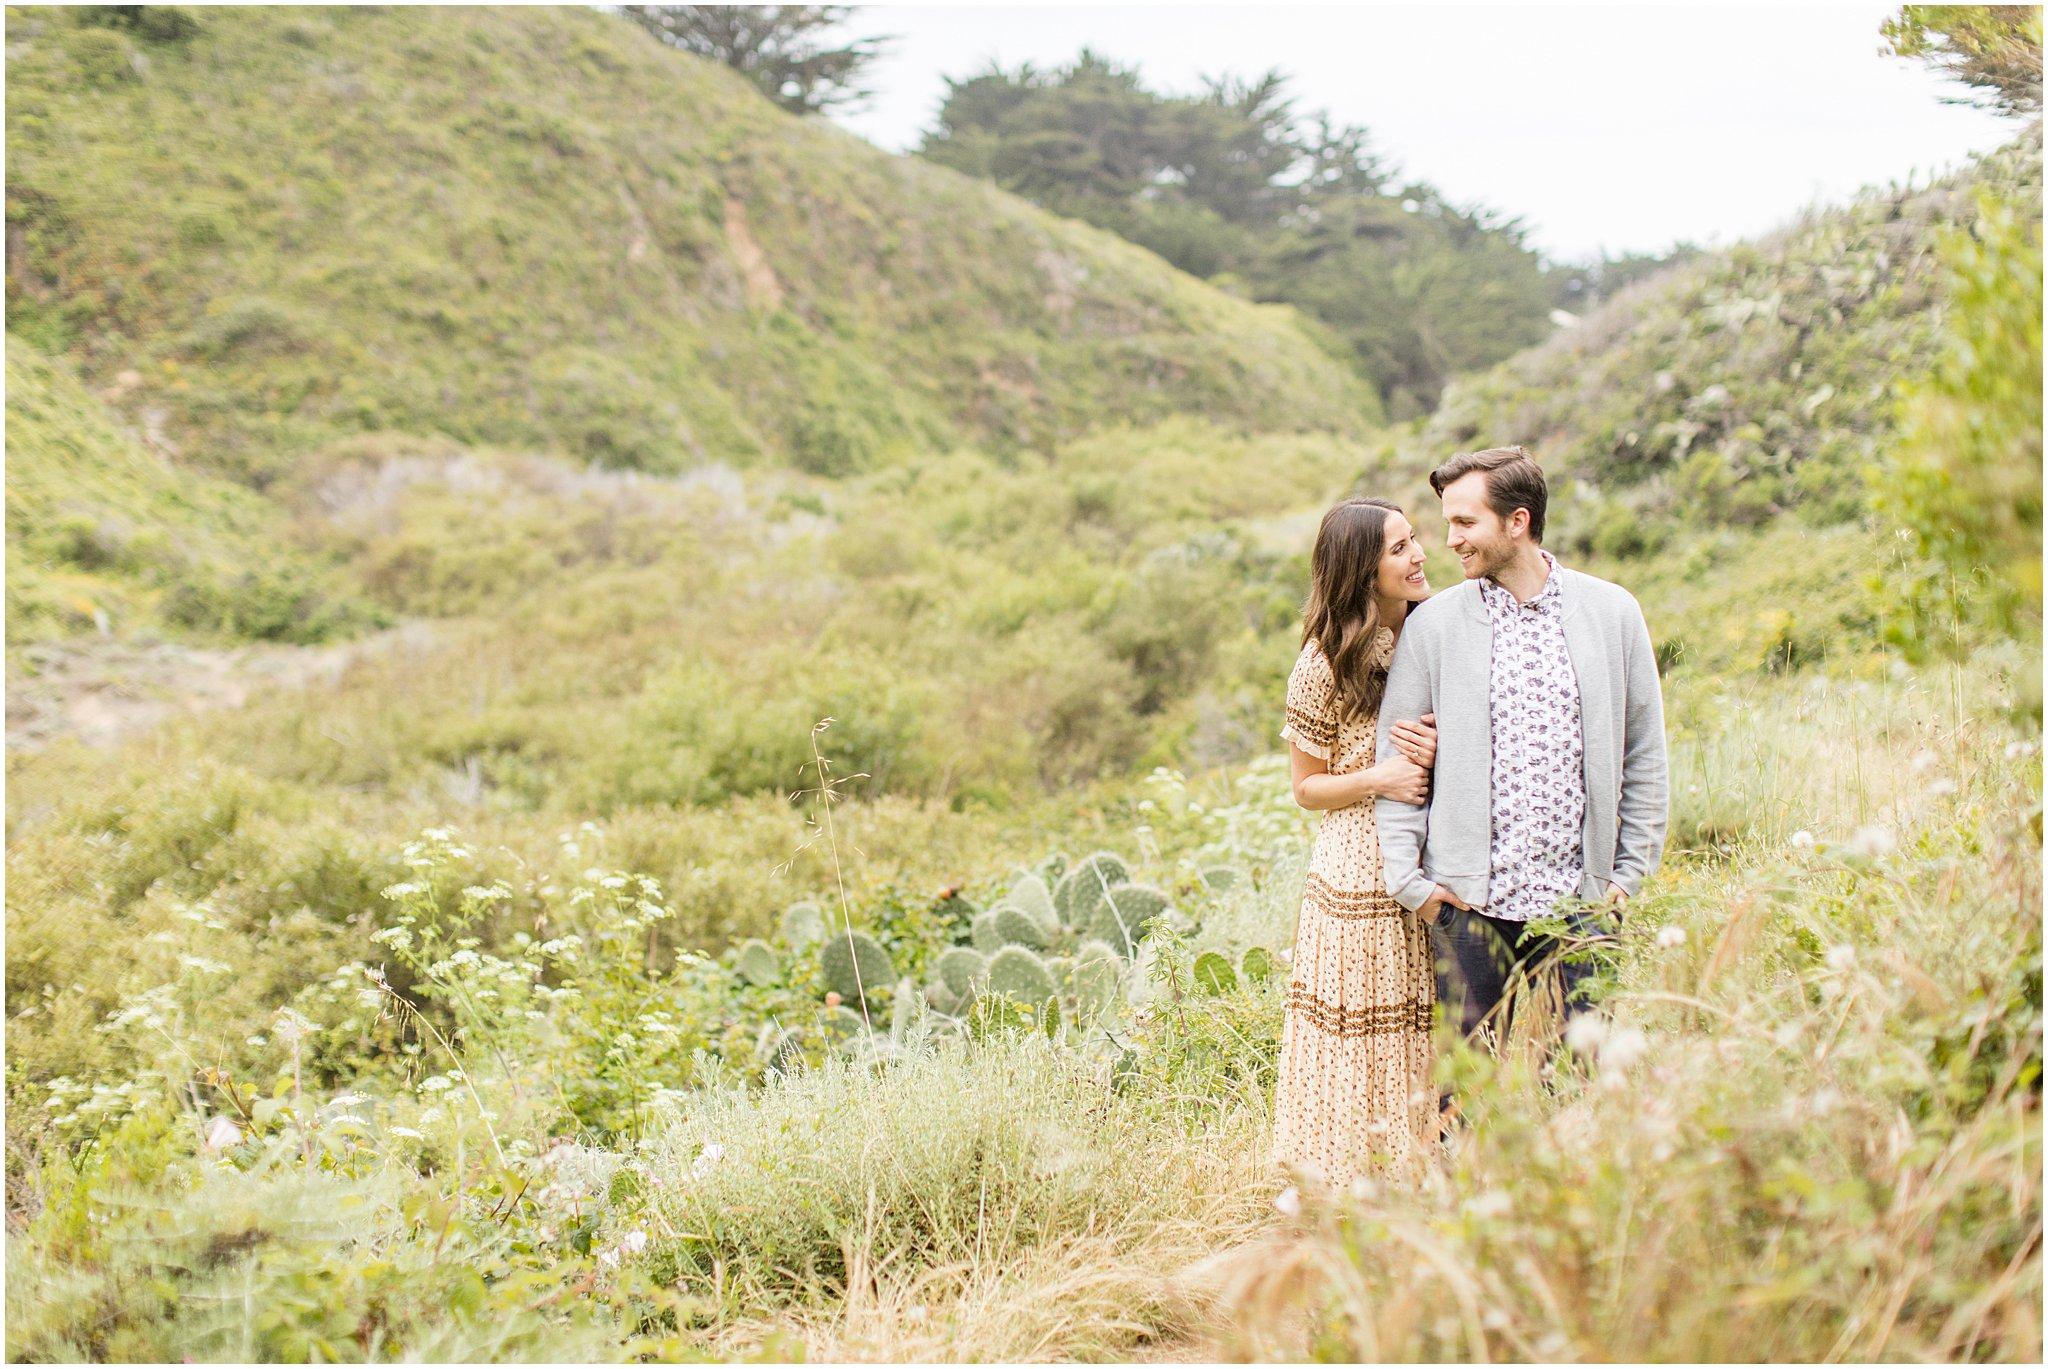 2019 carmel highlands garrapata state park couples portrait session bay area wedding photographer_0007.jpg